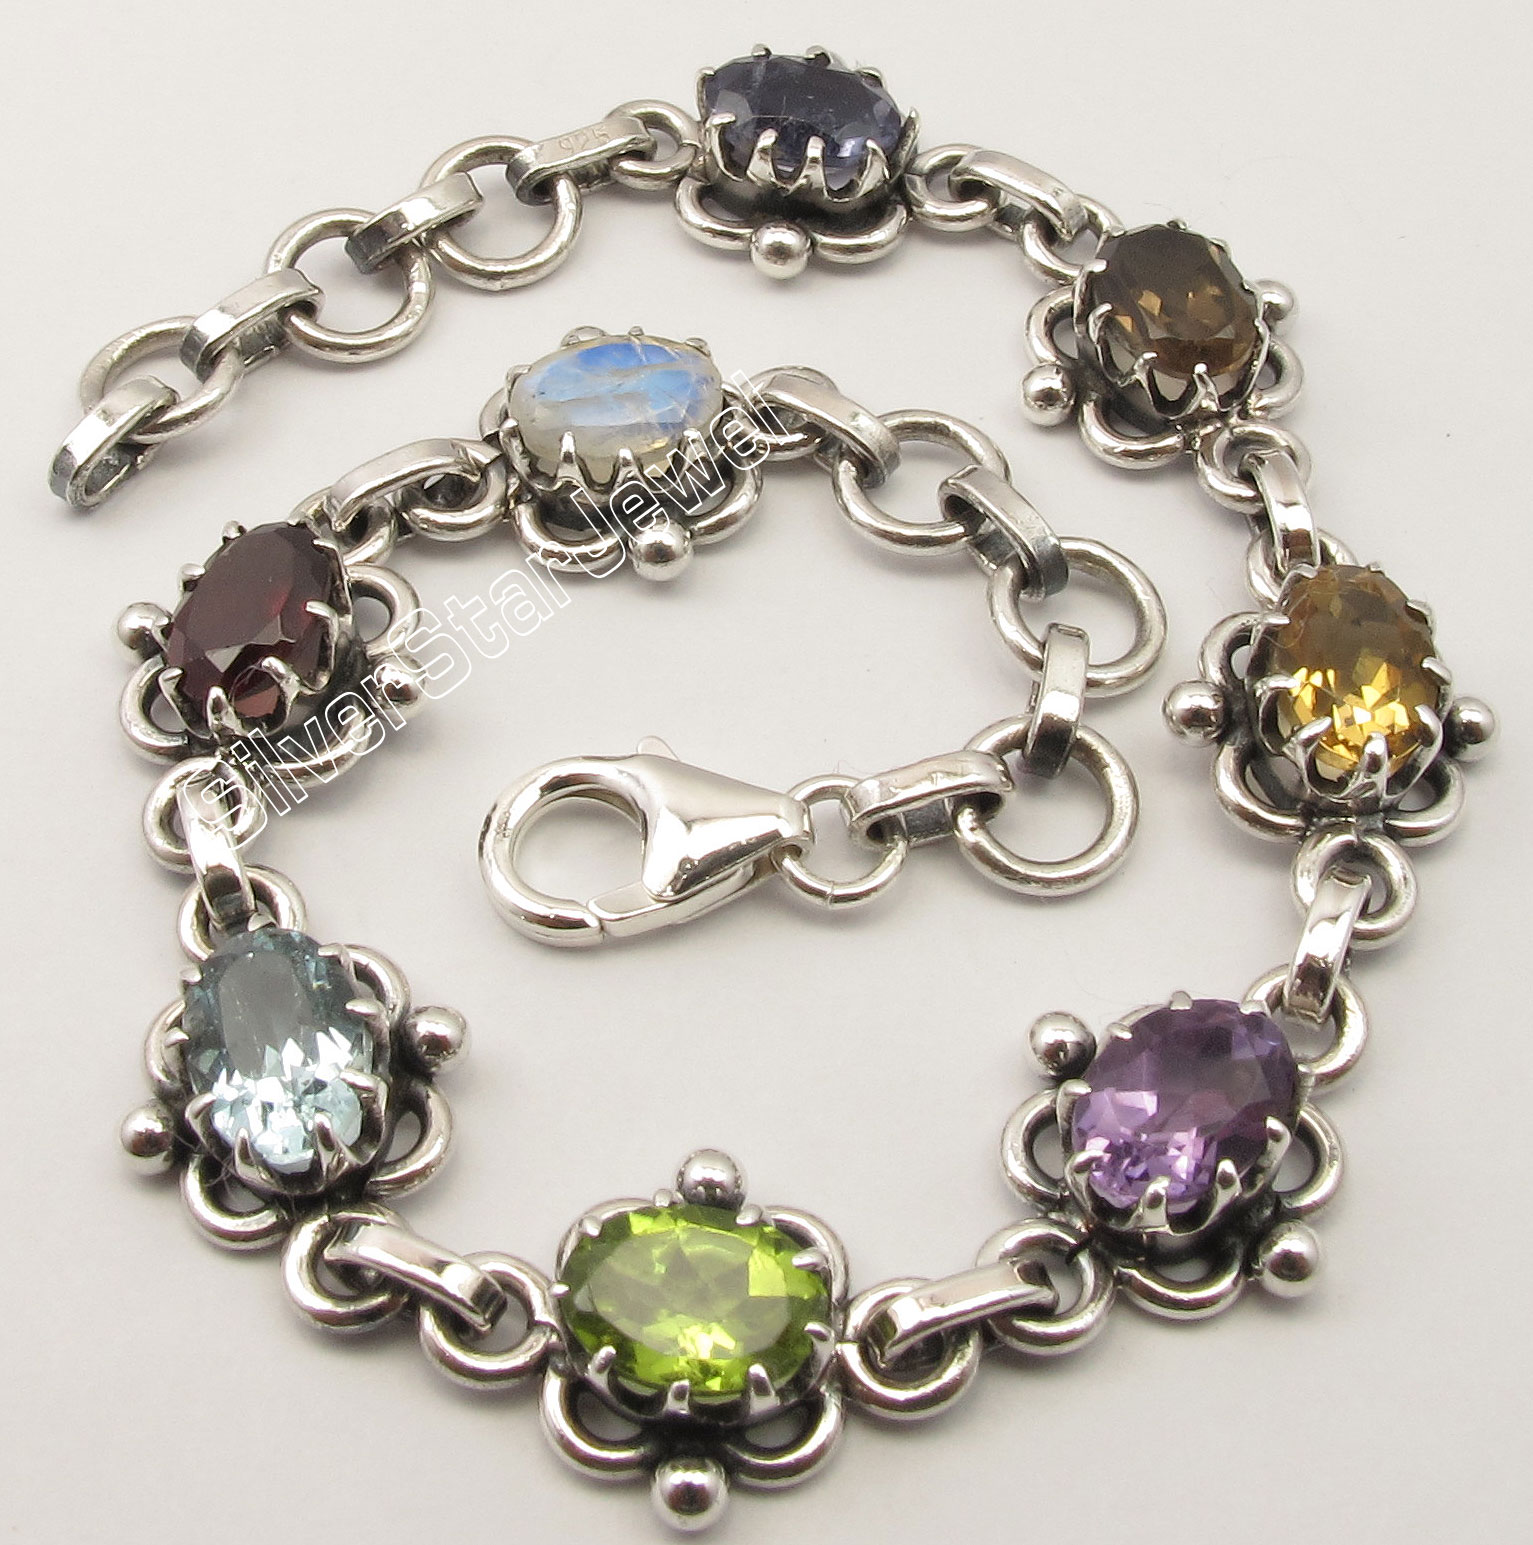 Chanti International Pure Silver MULTISTONES CLAW Setting ETHNIC Bracelet 7 3/4 Inches OXIDIZED